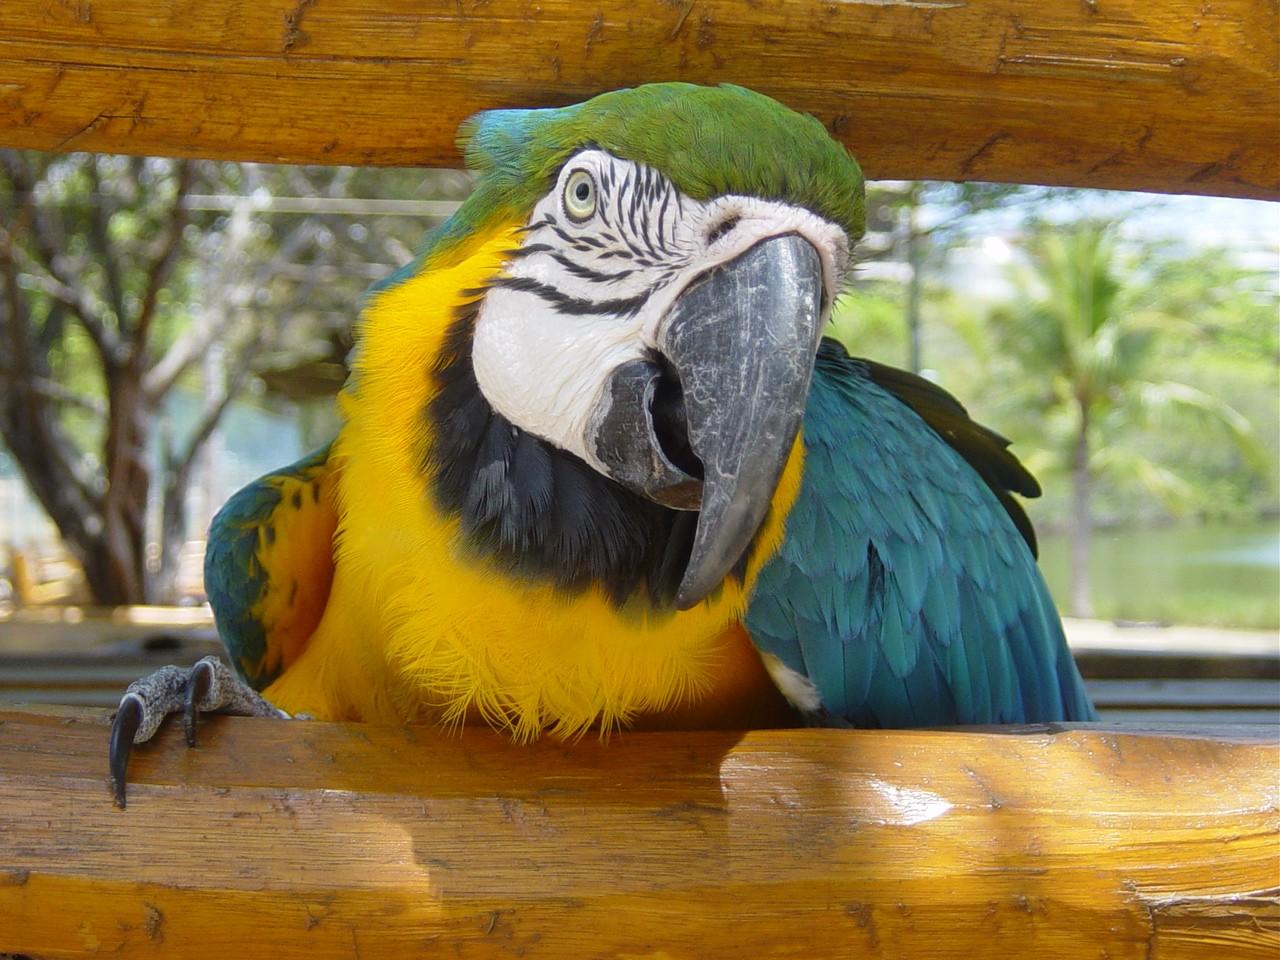 Jardim Botanico de Curtiba – Brazylia